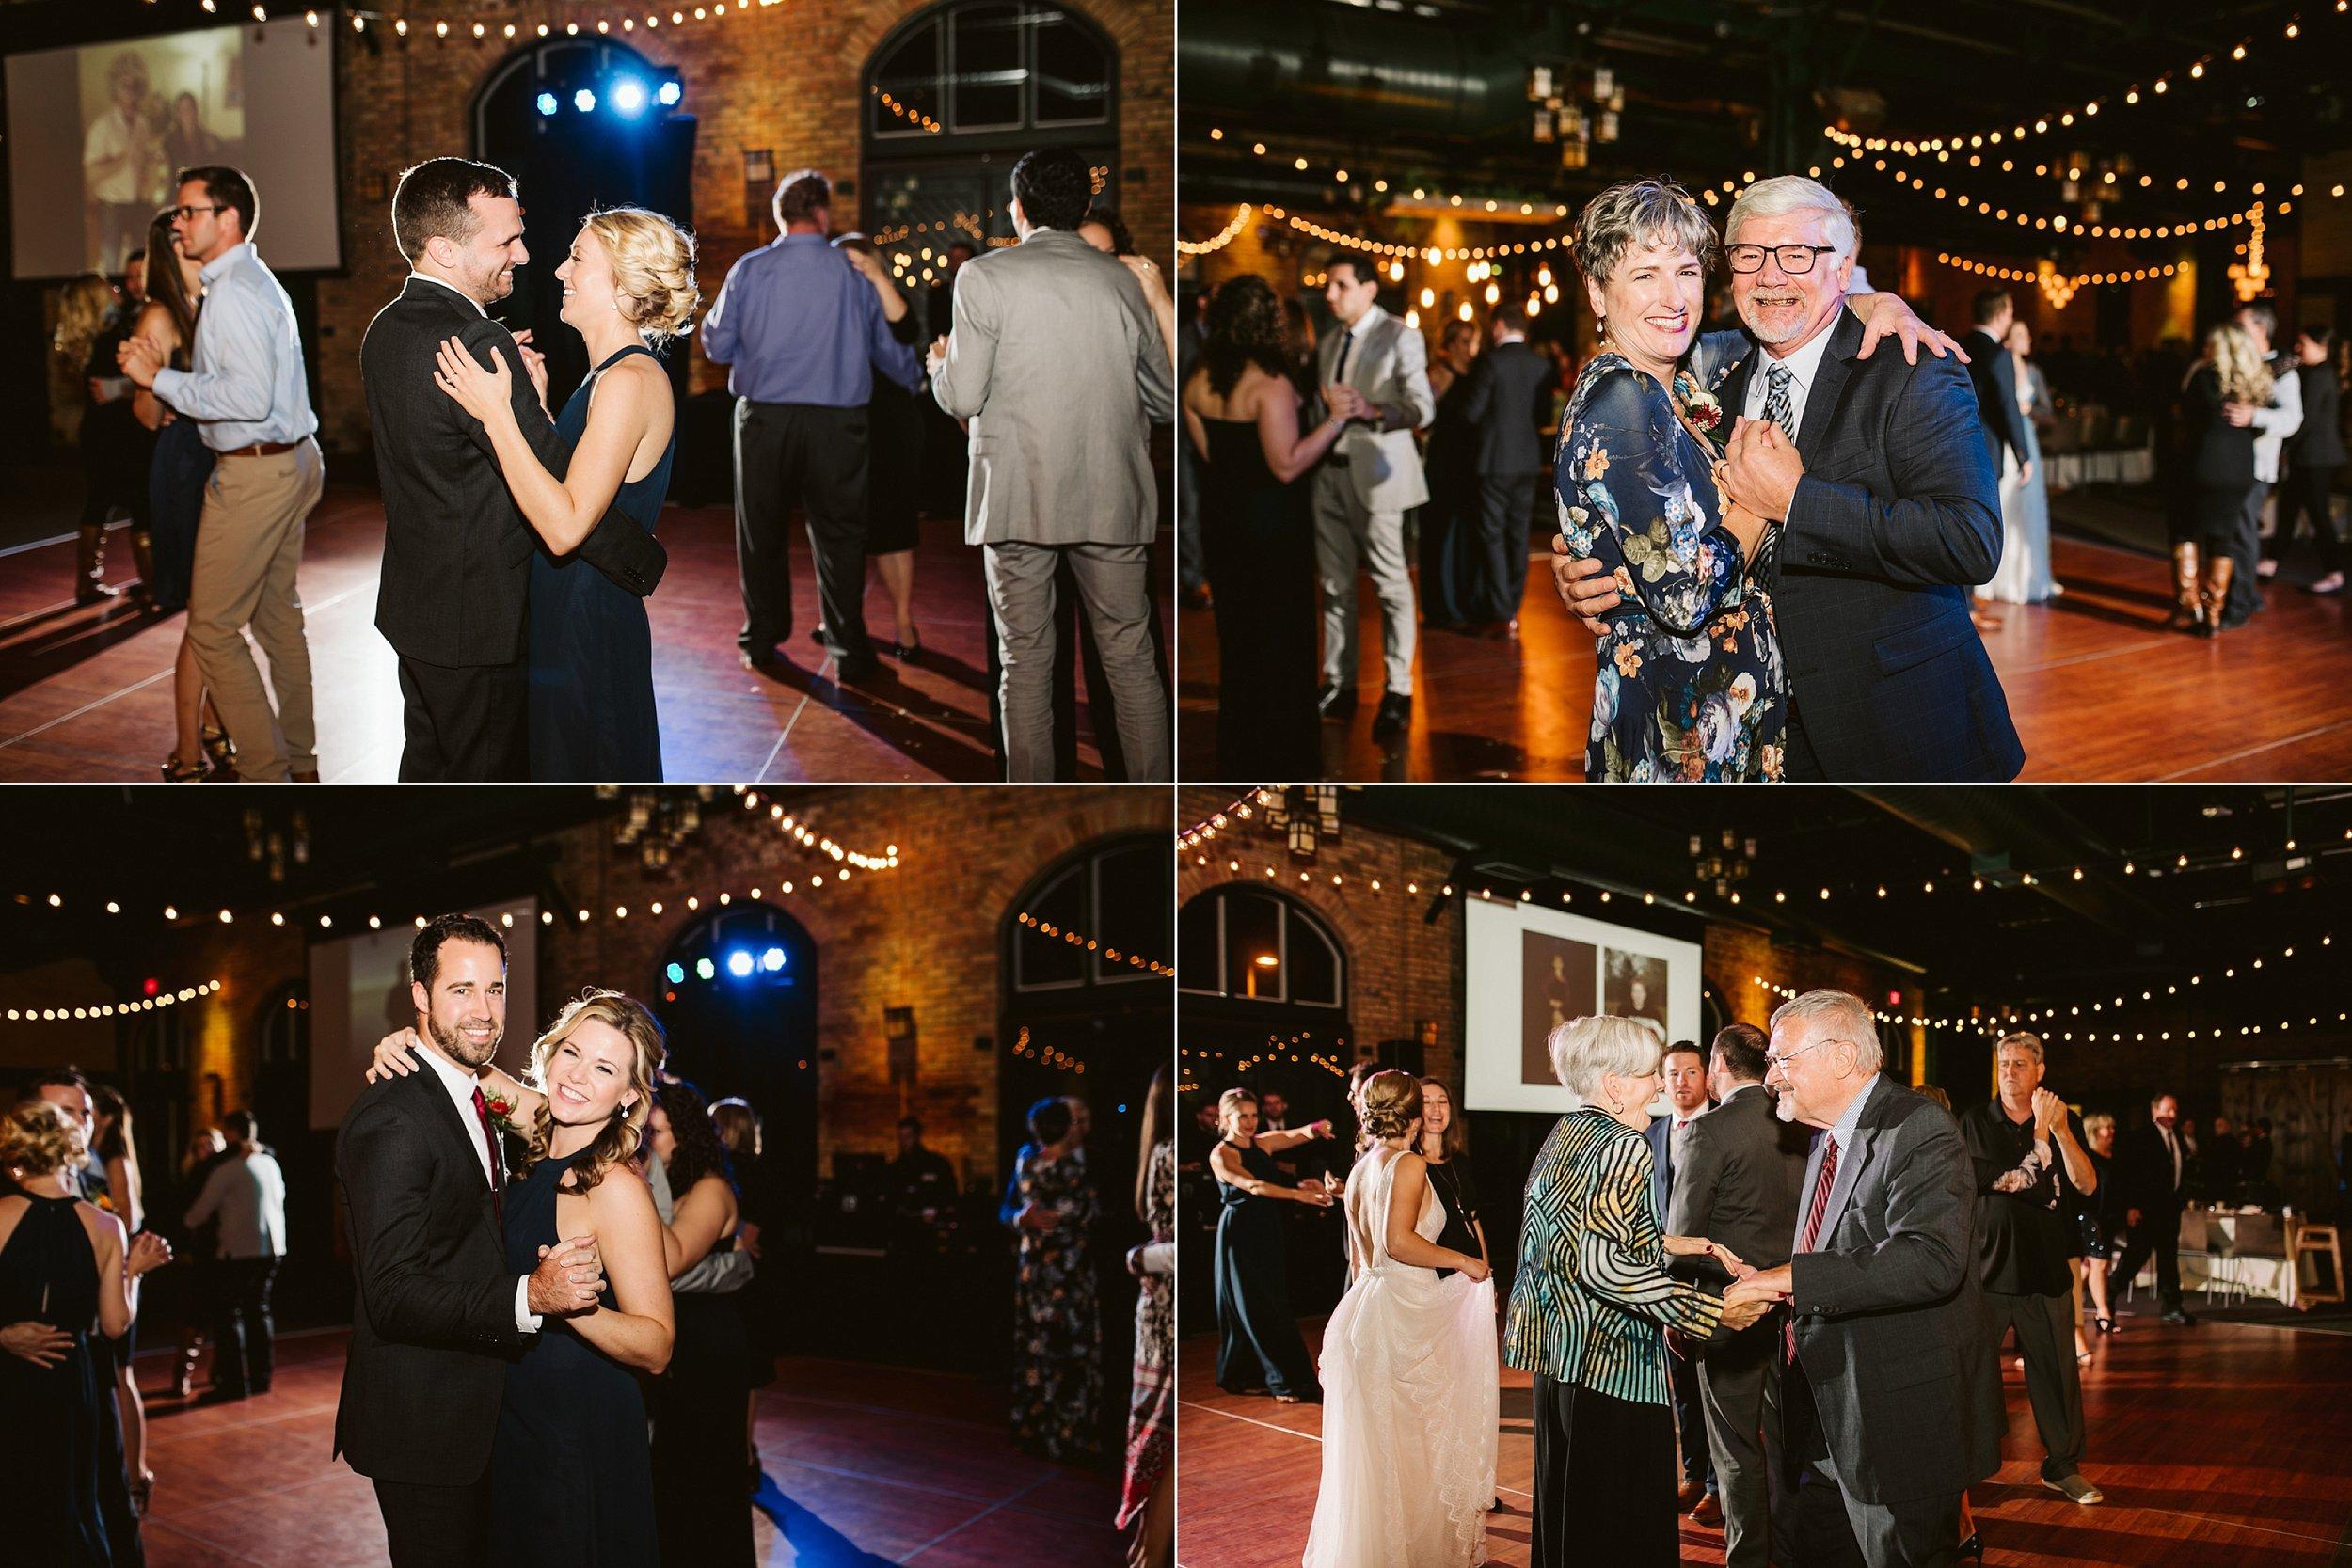 Nicollet-Island-Pavilion-Minneapolis-September-Coral-Navy-Wedding-189.jpg